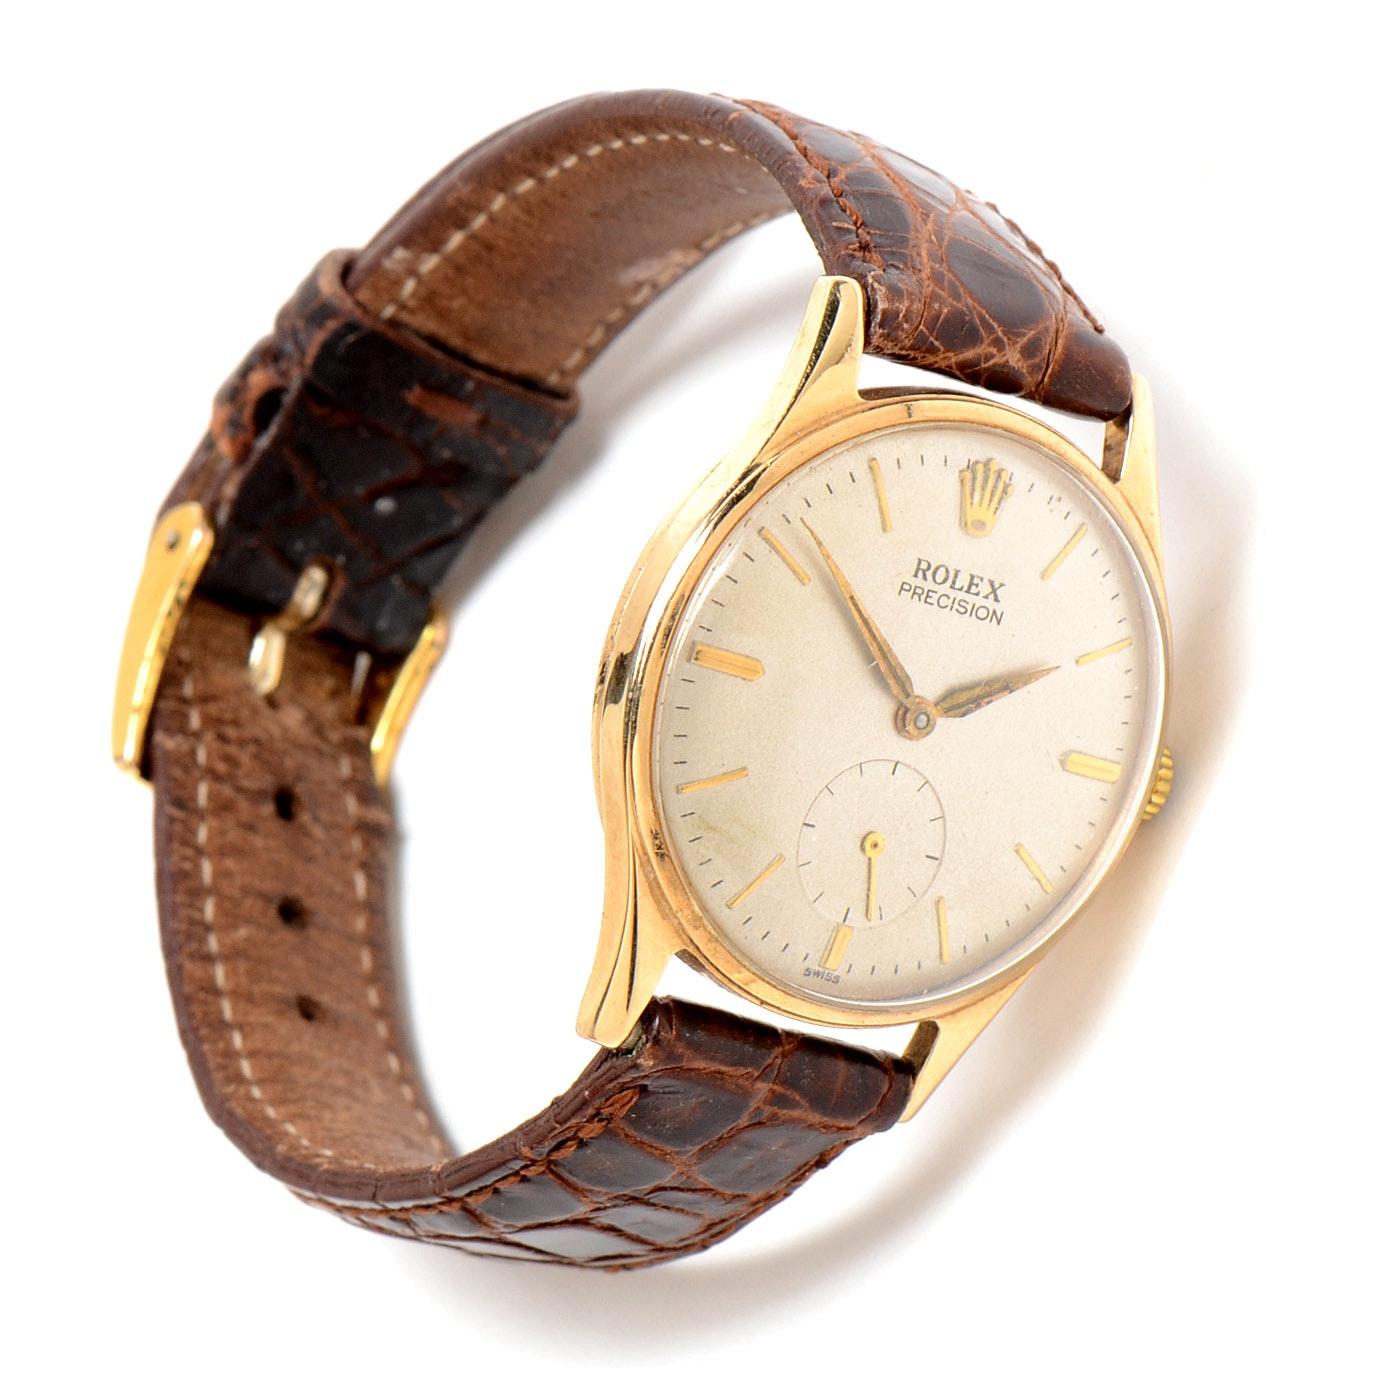 9K Yellow Gold Men's Rolex Precision Wristwatch